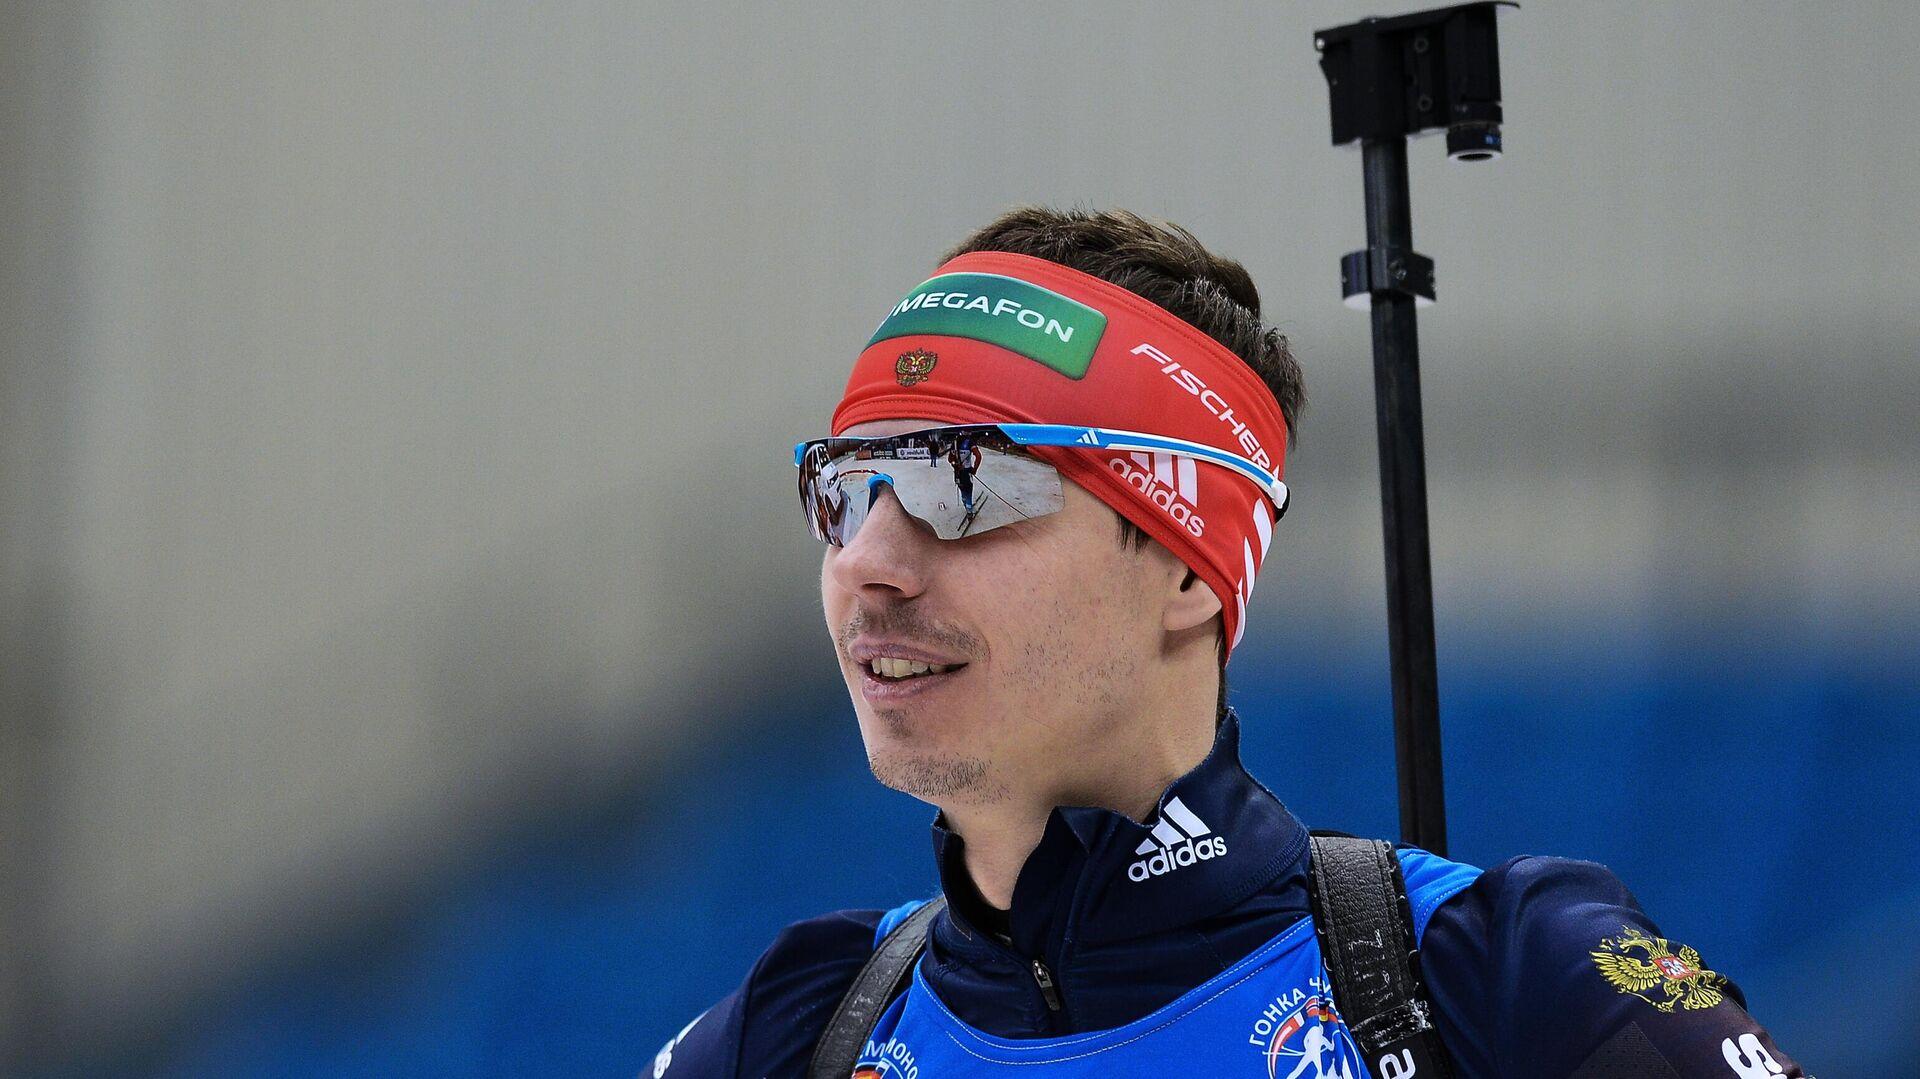 Биатлонист Евгений Устюгов - РИА Новости, 1920, 14.10.2021